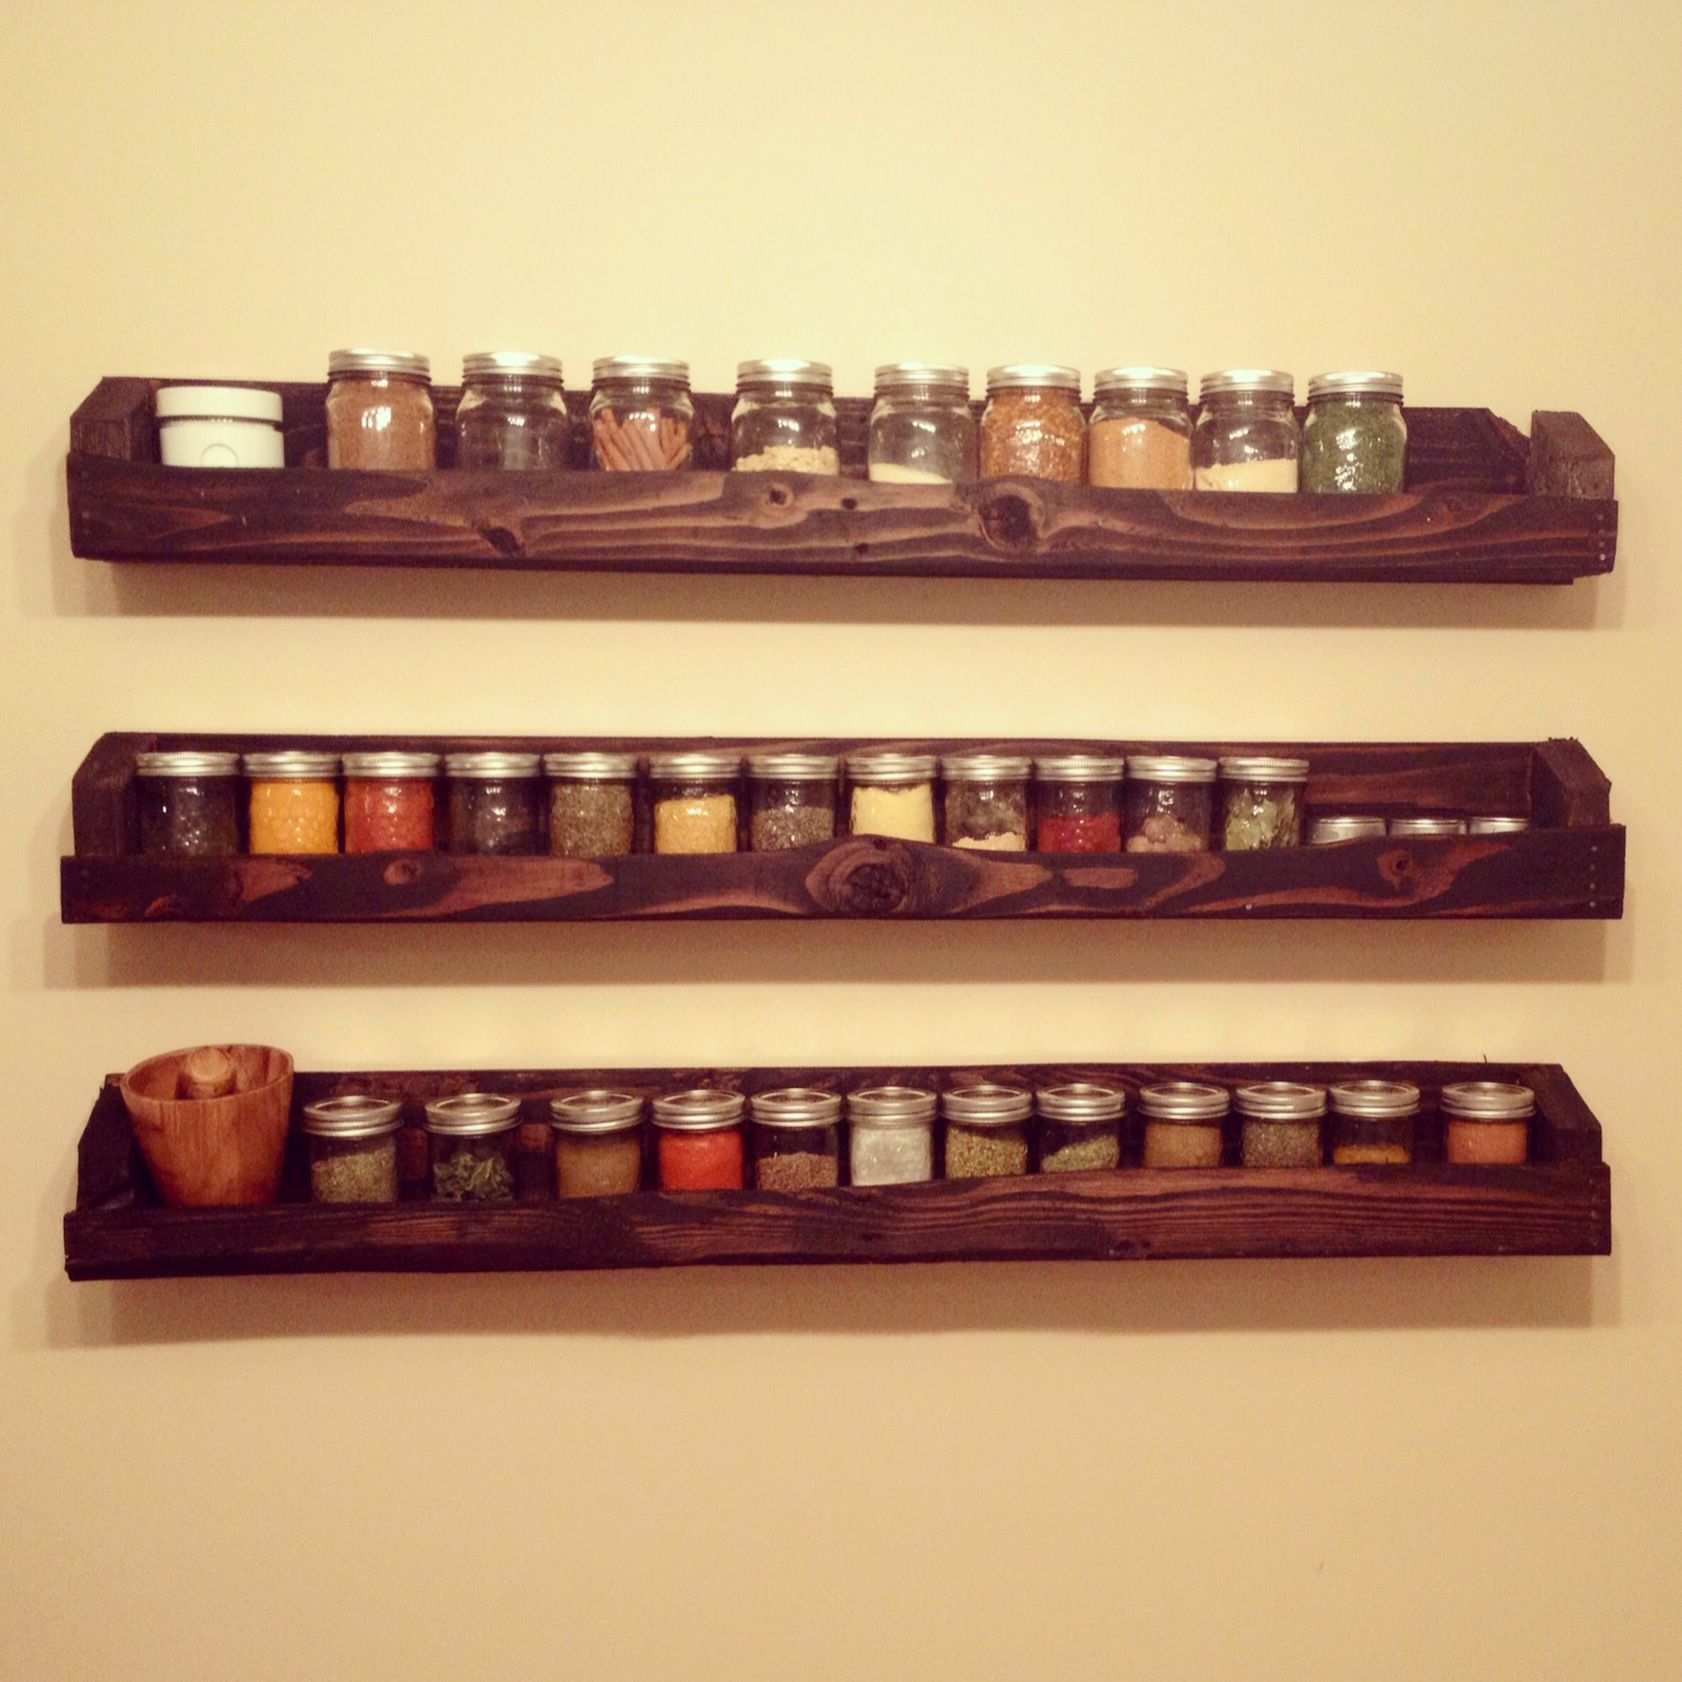 Pallet and mason jar spice rack :) | Mason jar storage | Pinterest ...